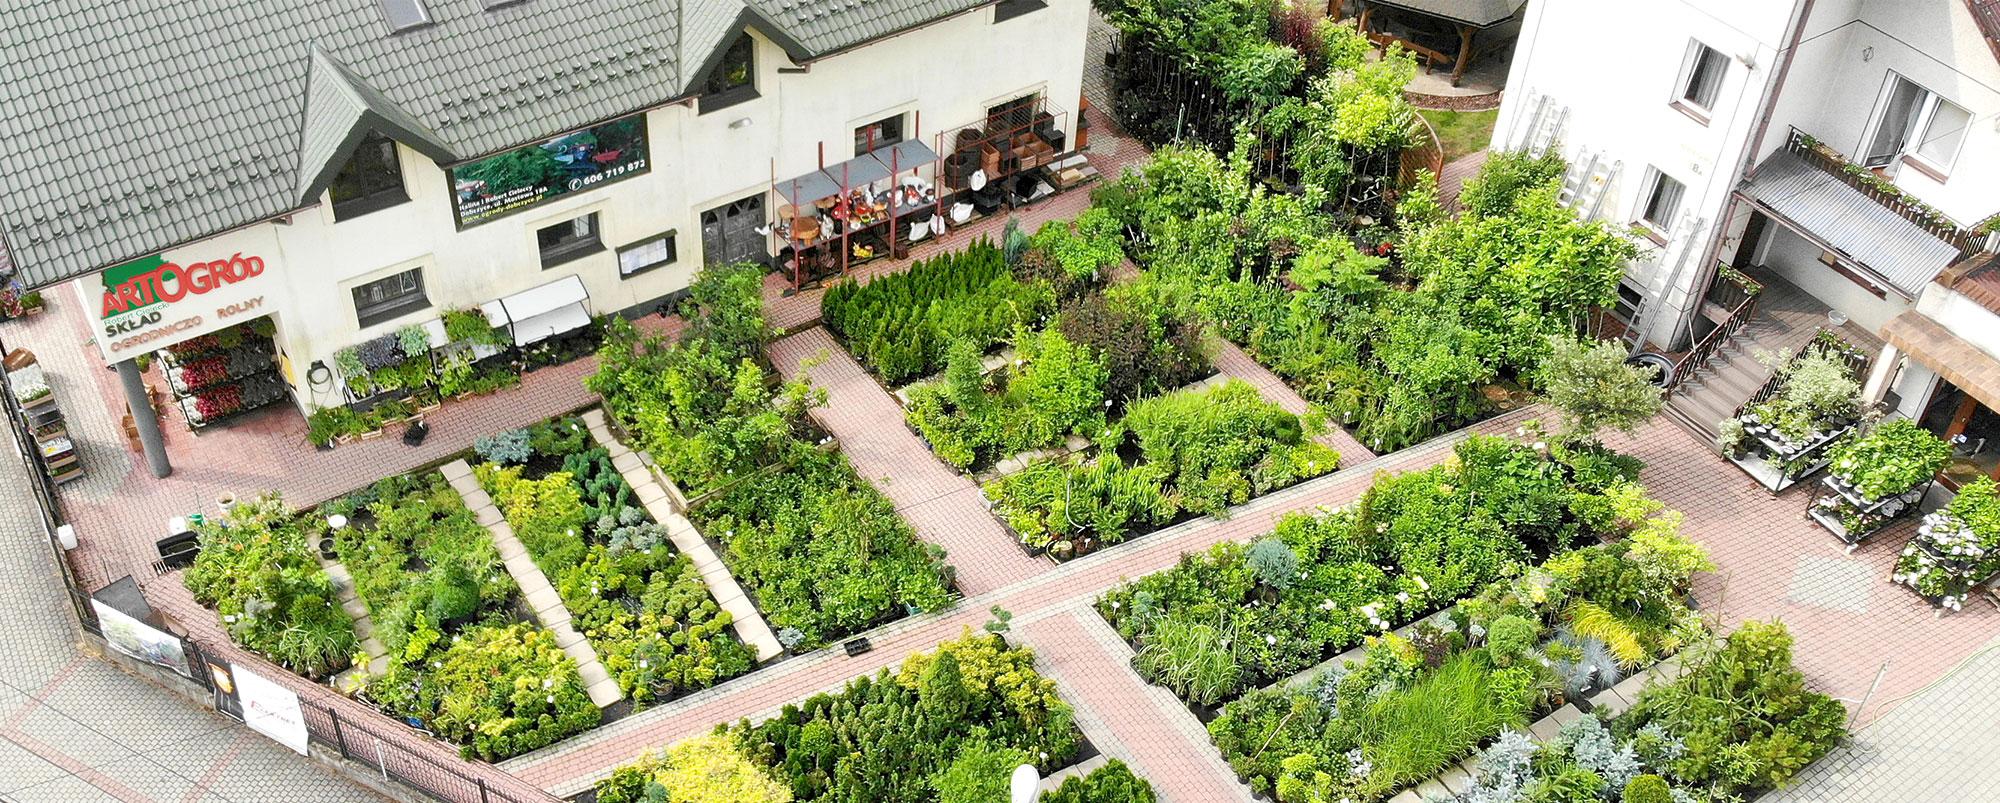 Sklepy ogrodnicze